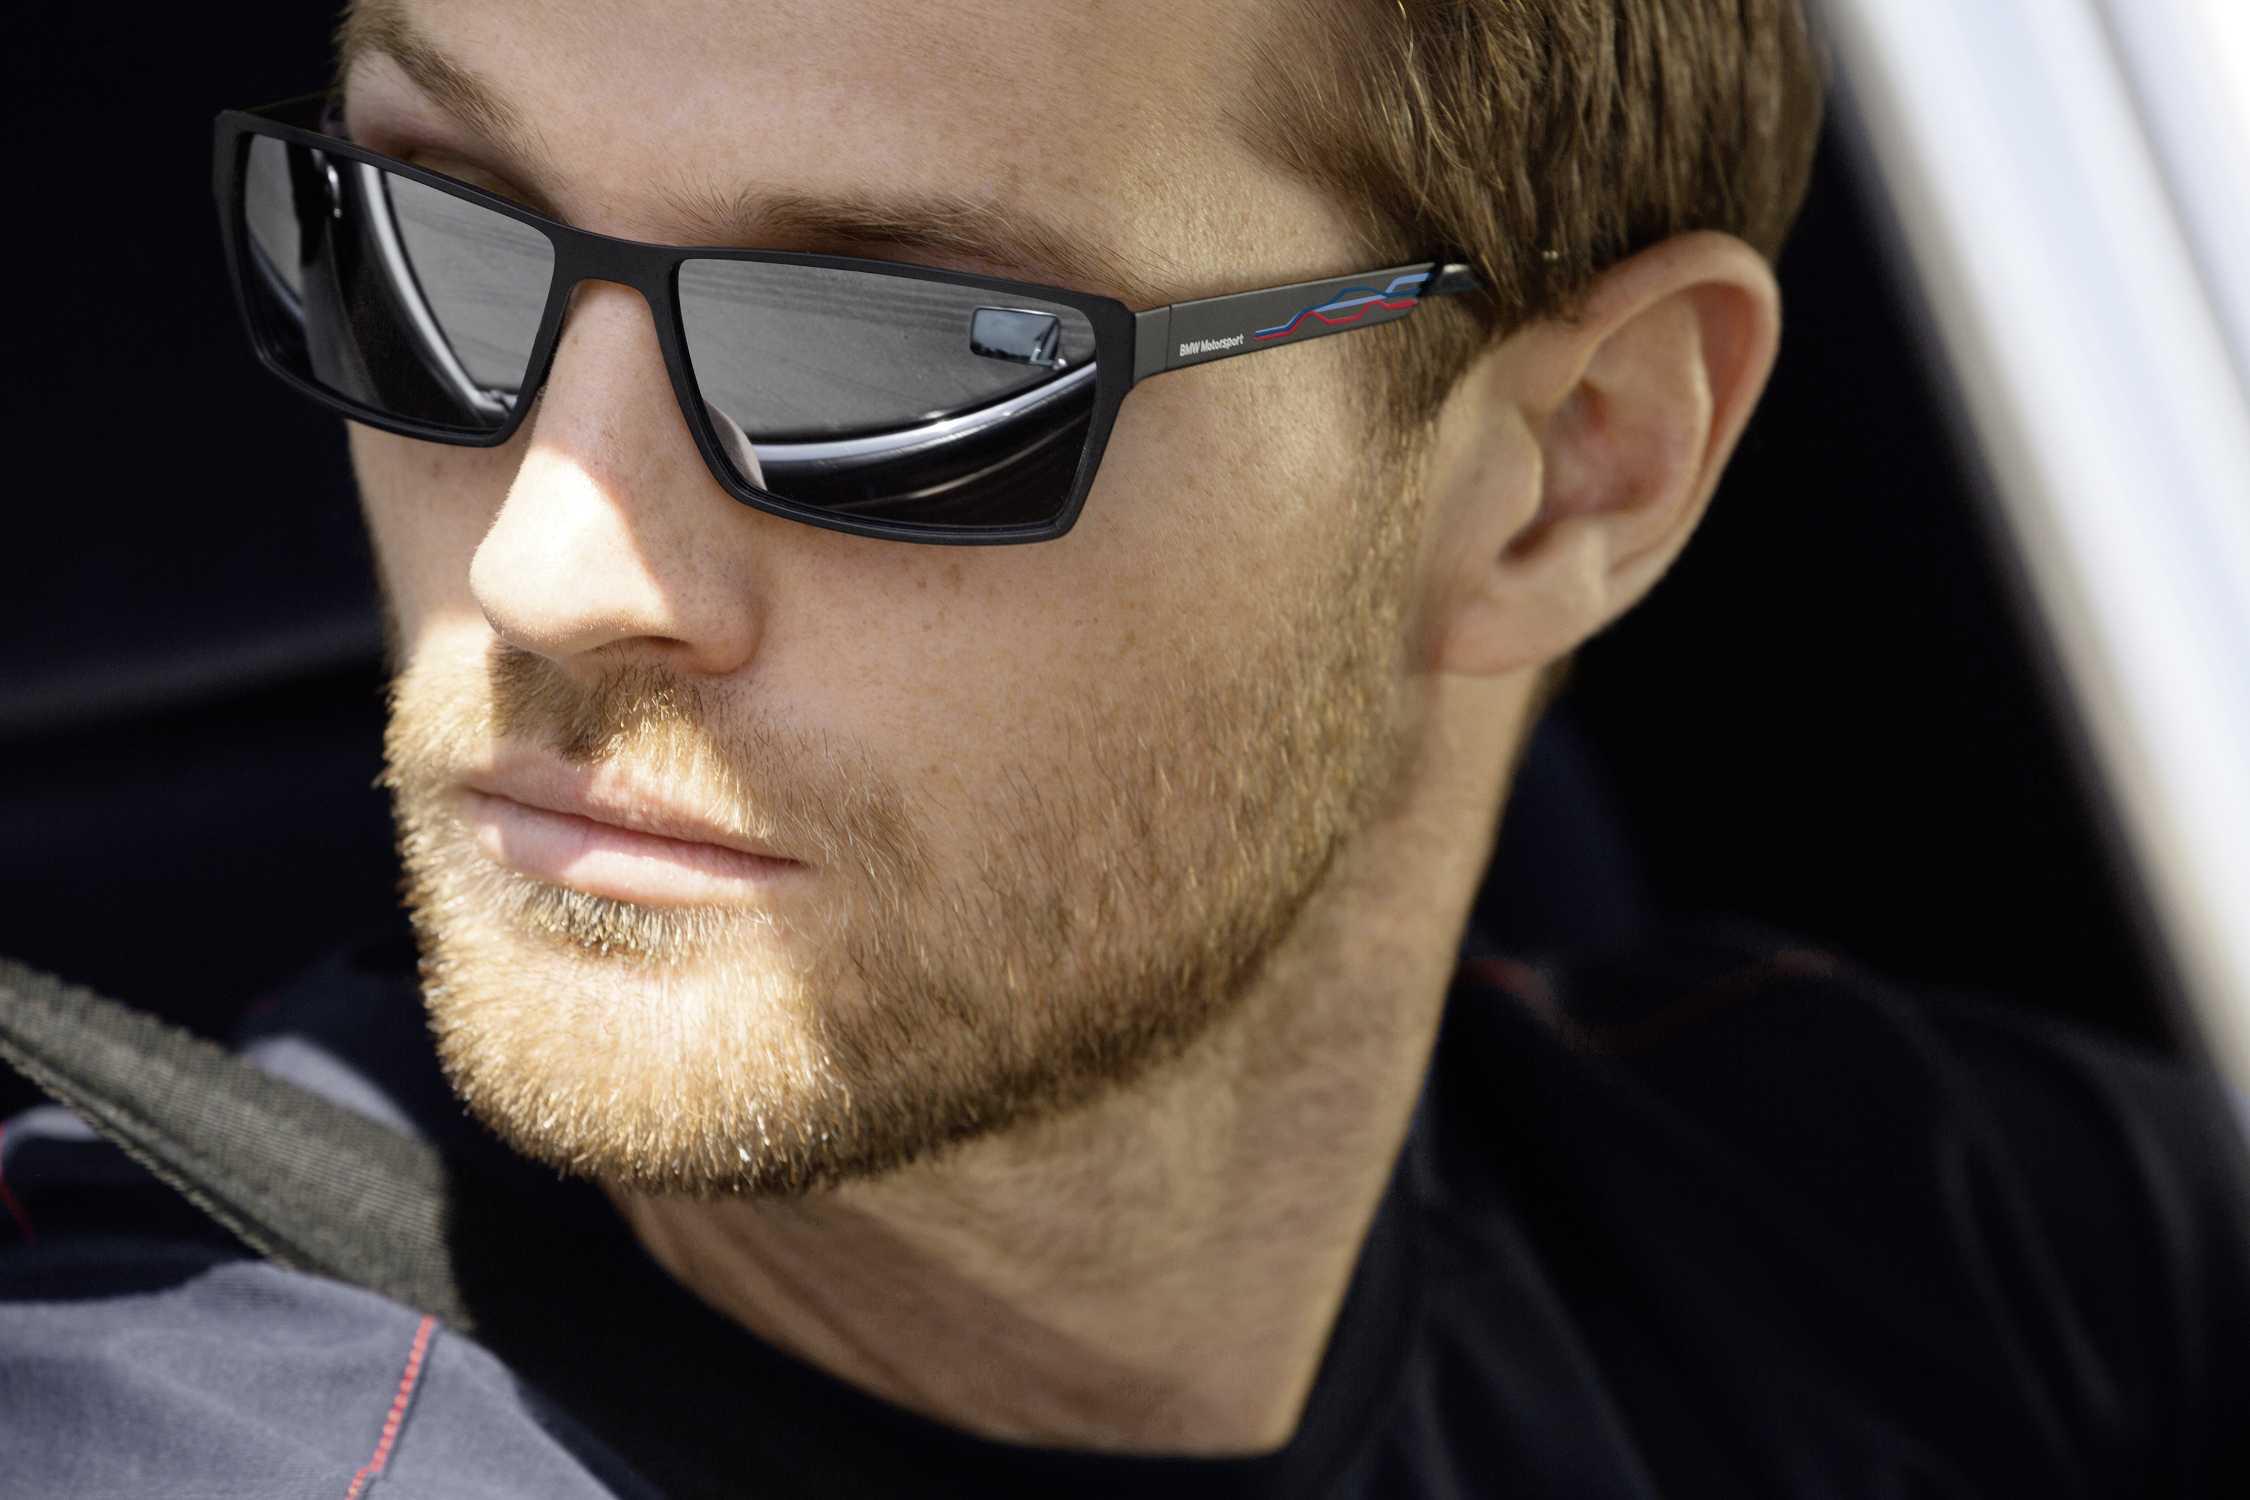 form puts from led for sunglasses en download racing pr motorsport top press osram light team media in lichtbrille releases bmw